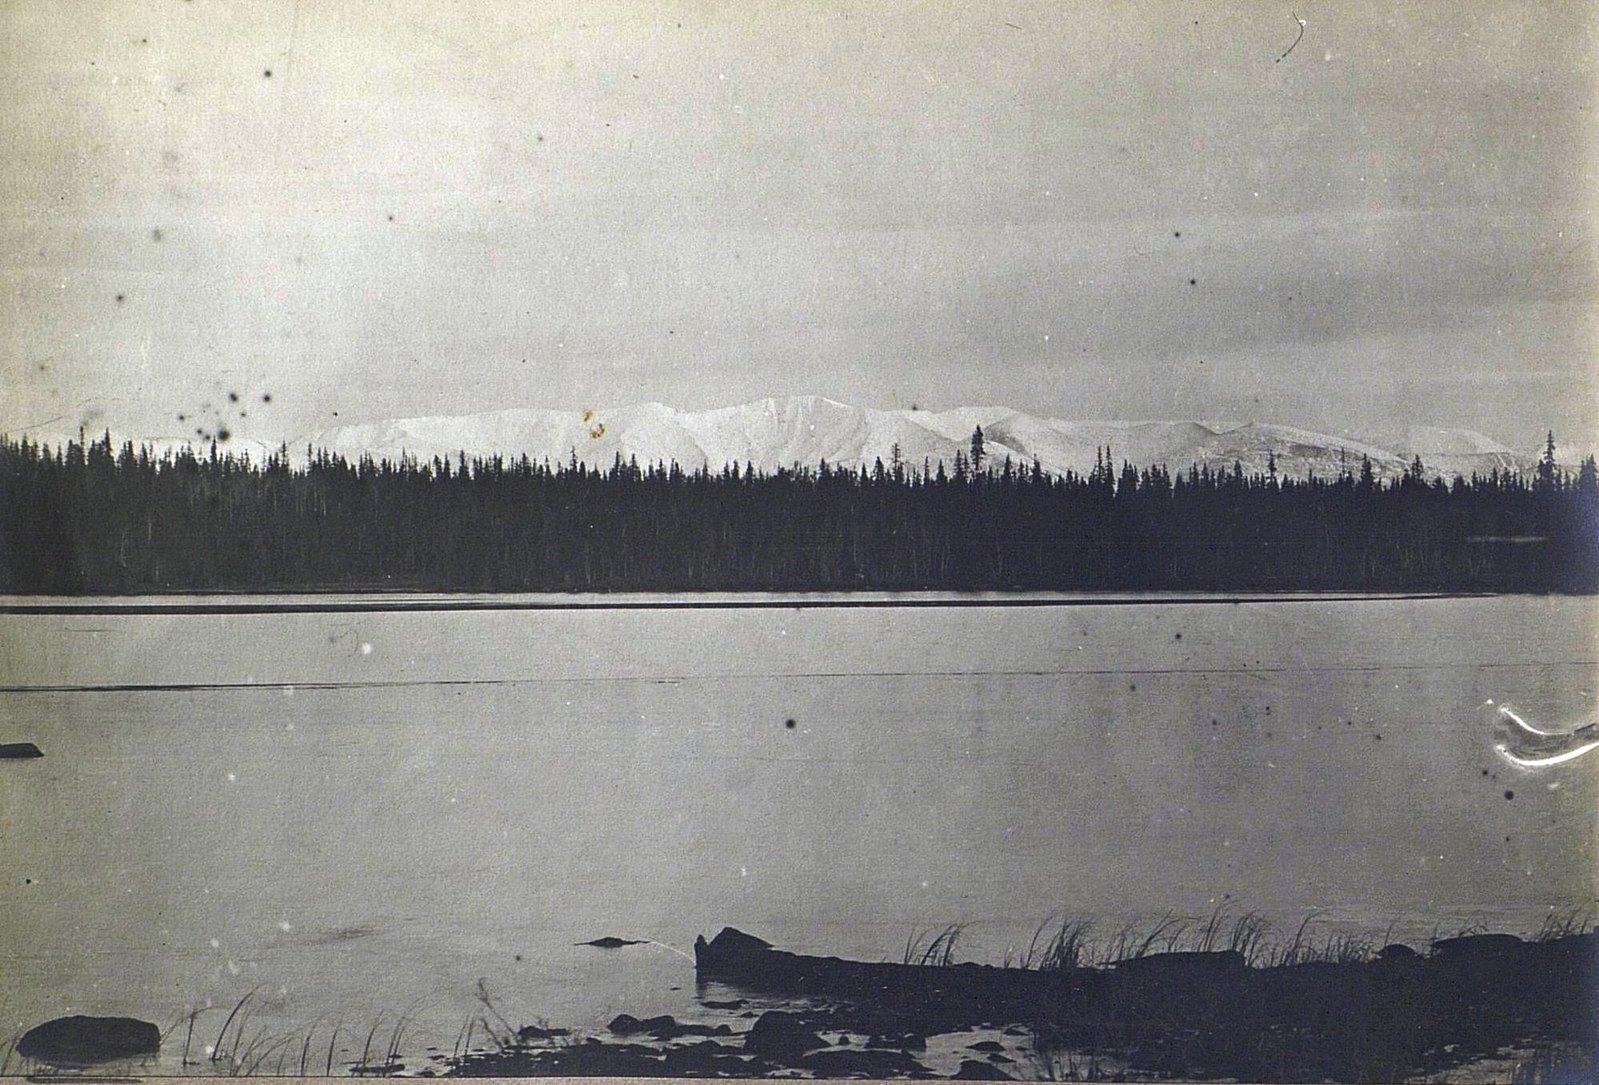 Вид на оз. Имандра и Хибинские горы